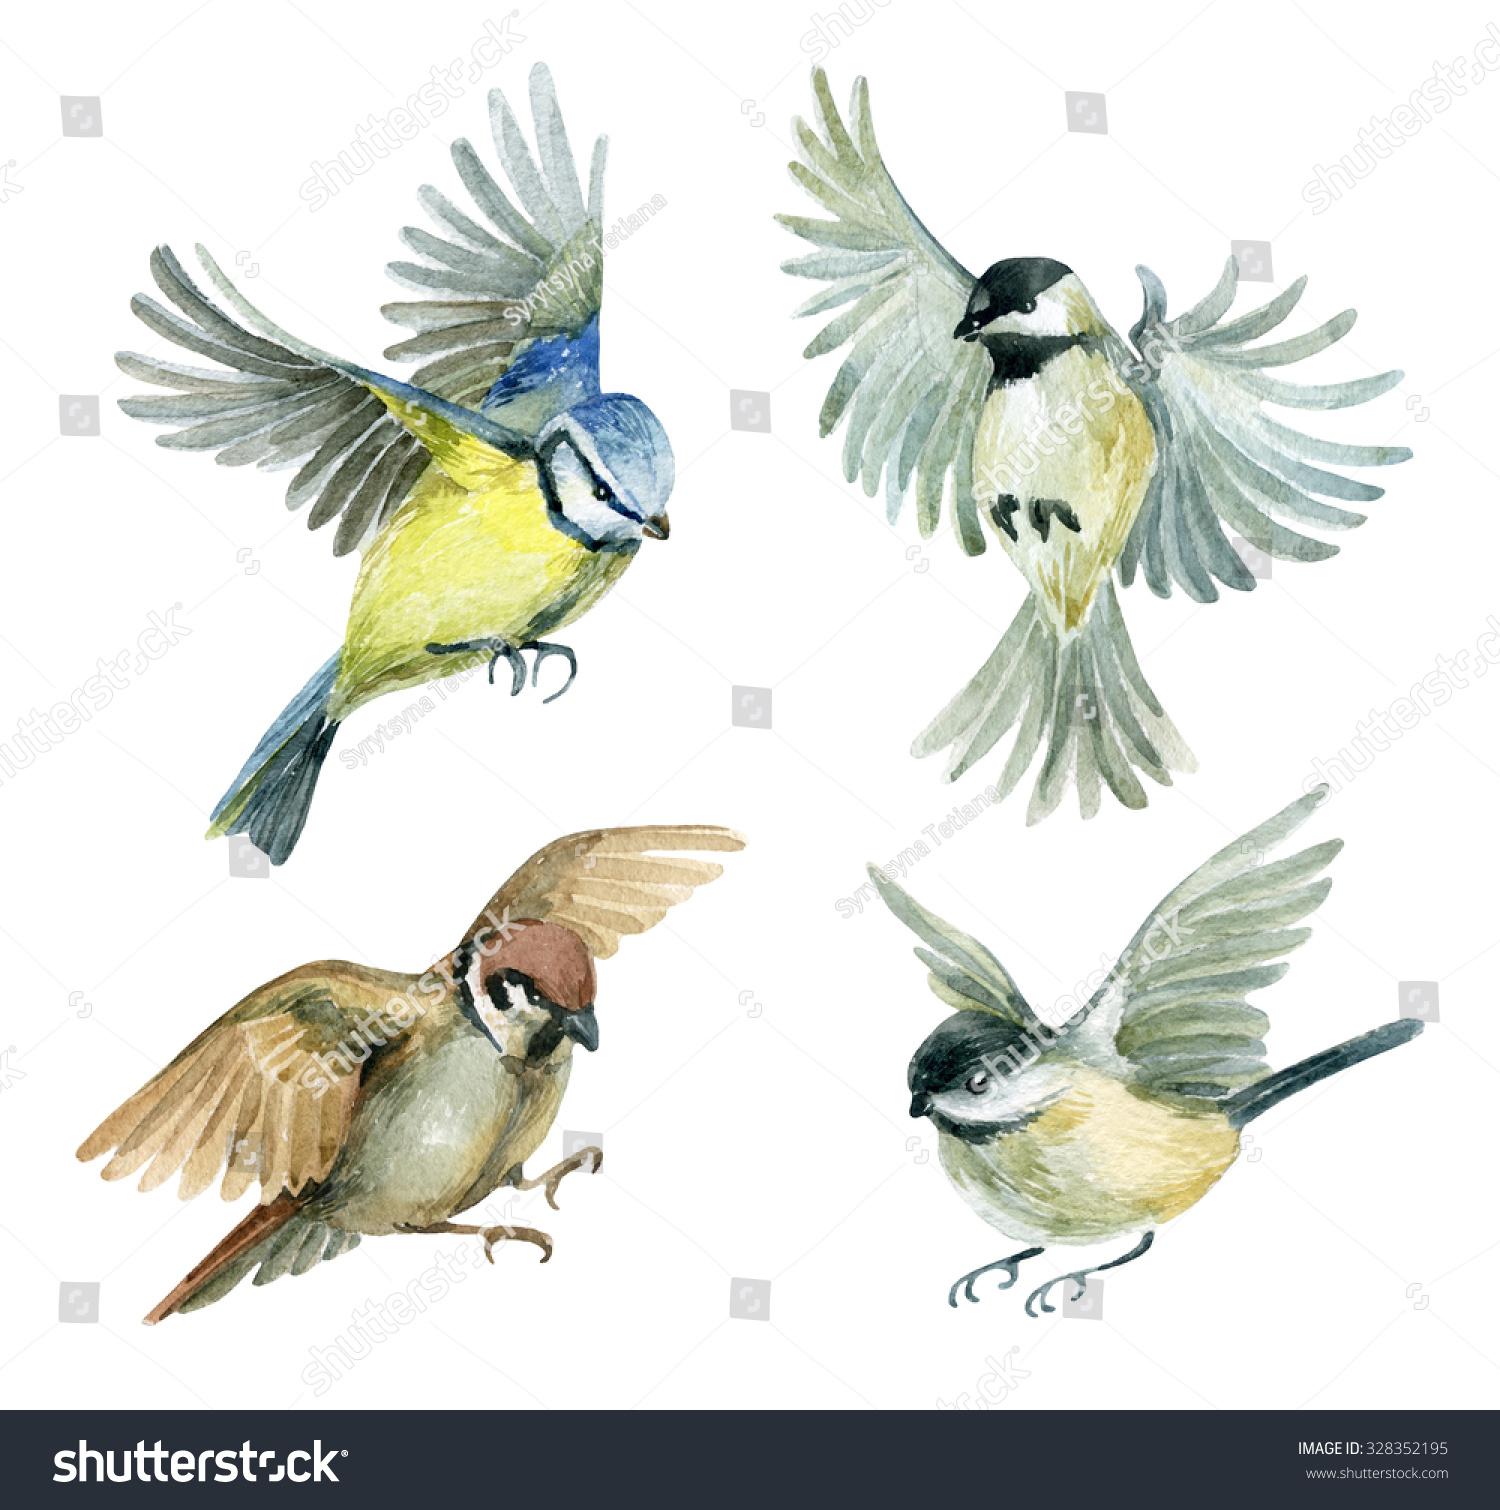 Flying bird illustration vintage - photo#25